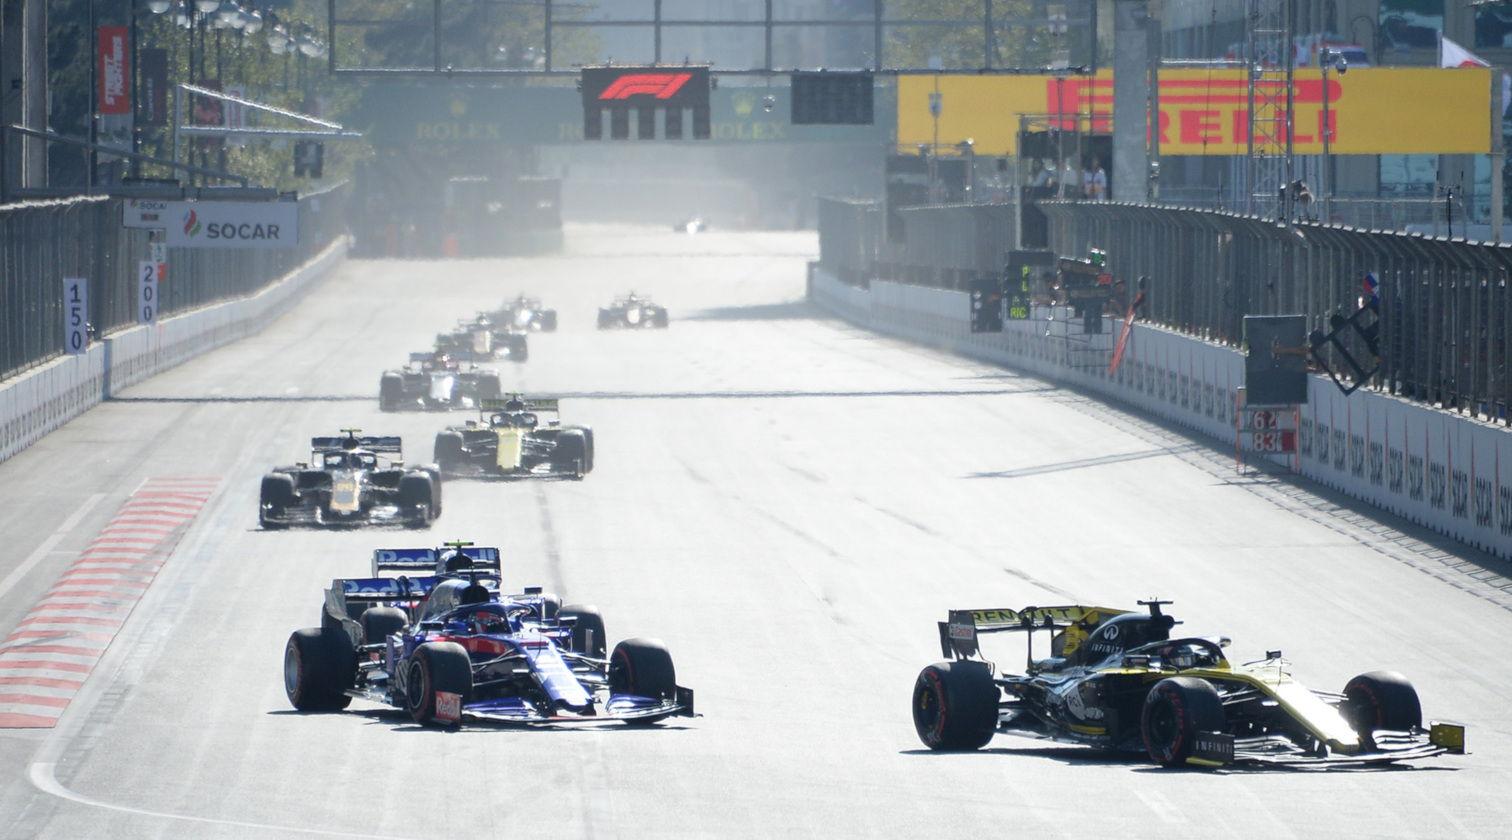 F1 cars racing at the Azerbaijan Grand Prix